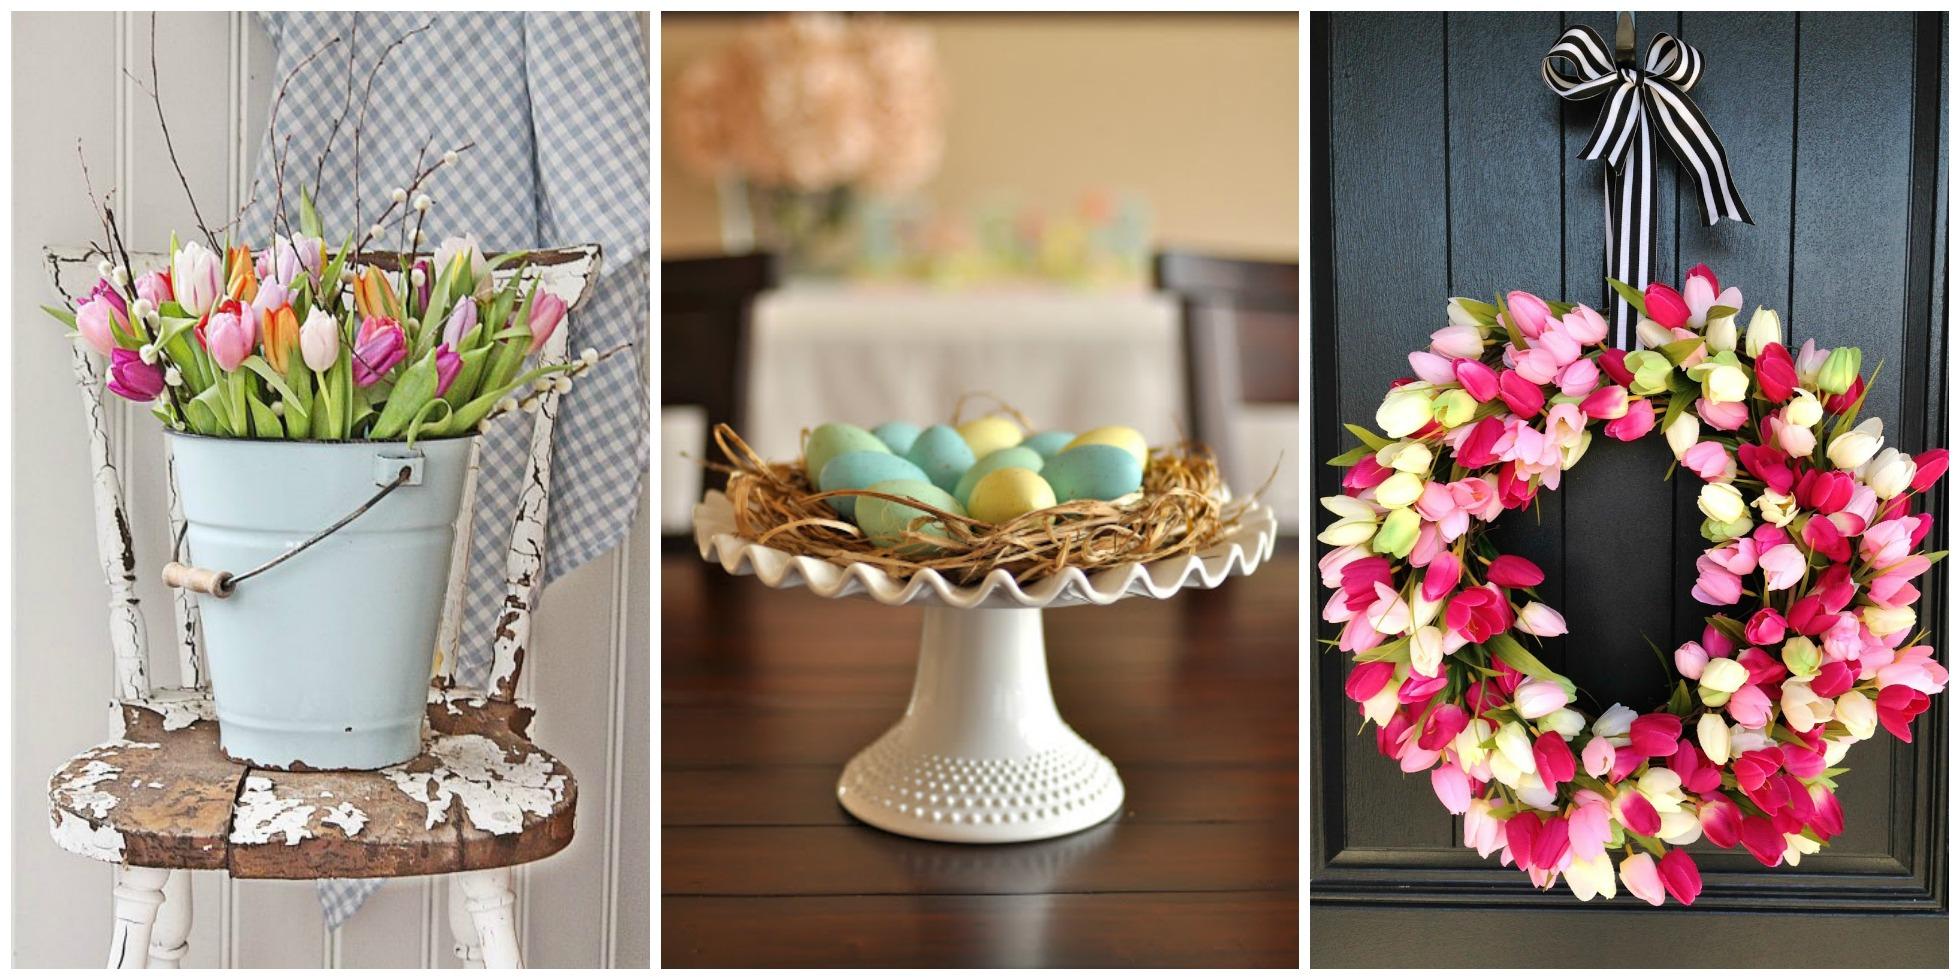 30 Easter Decoration Ideas  Easter Flower Arrangements